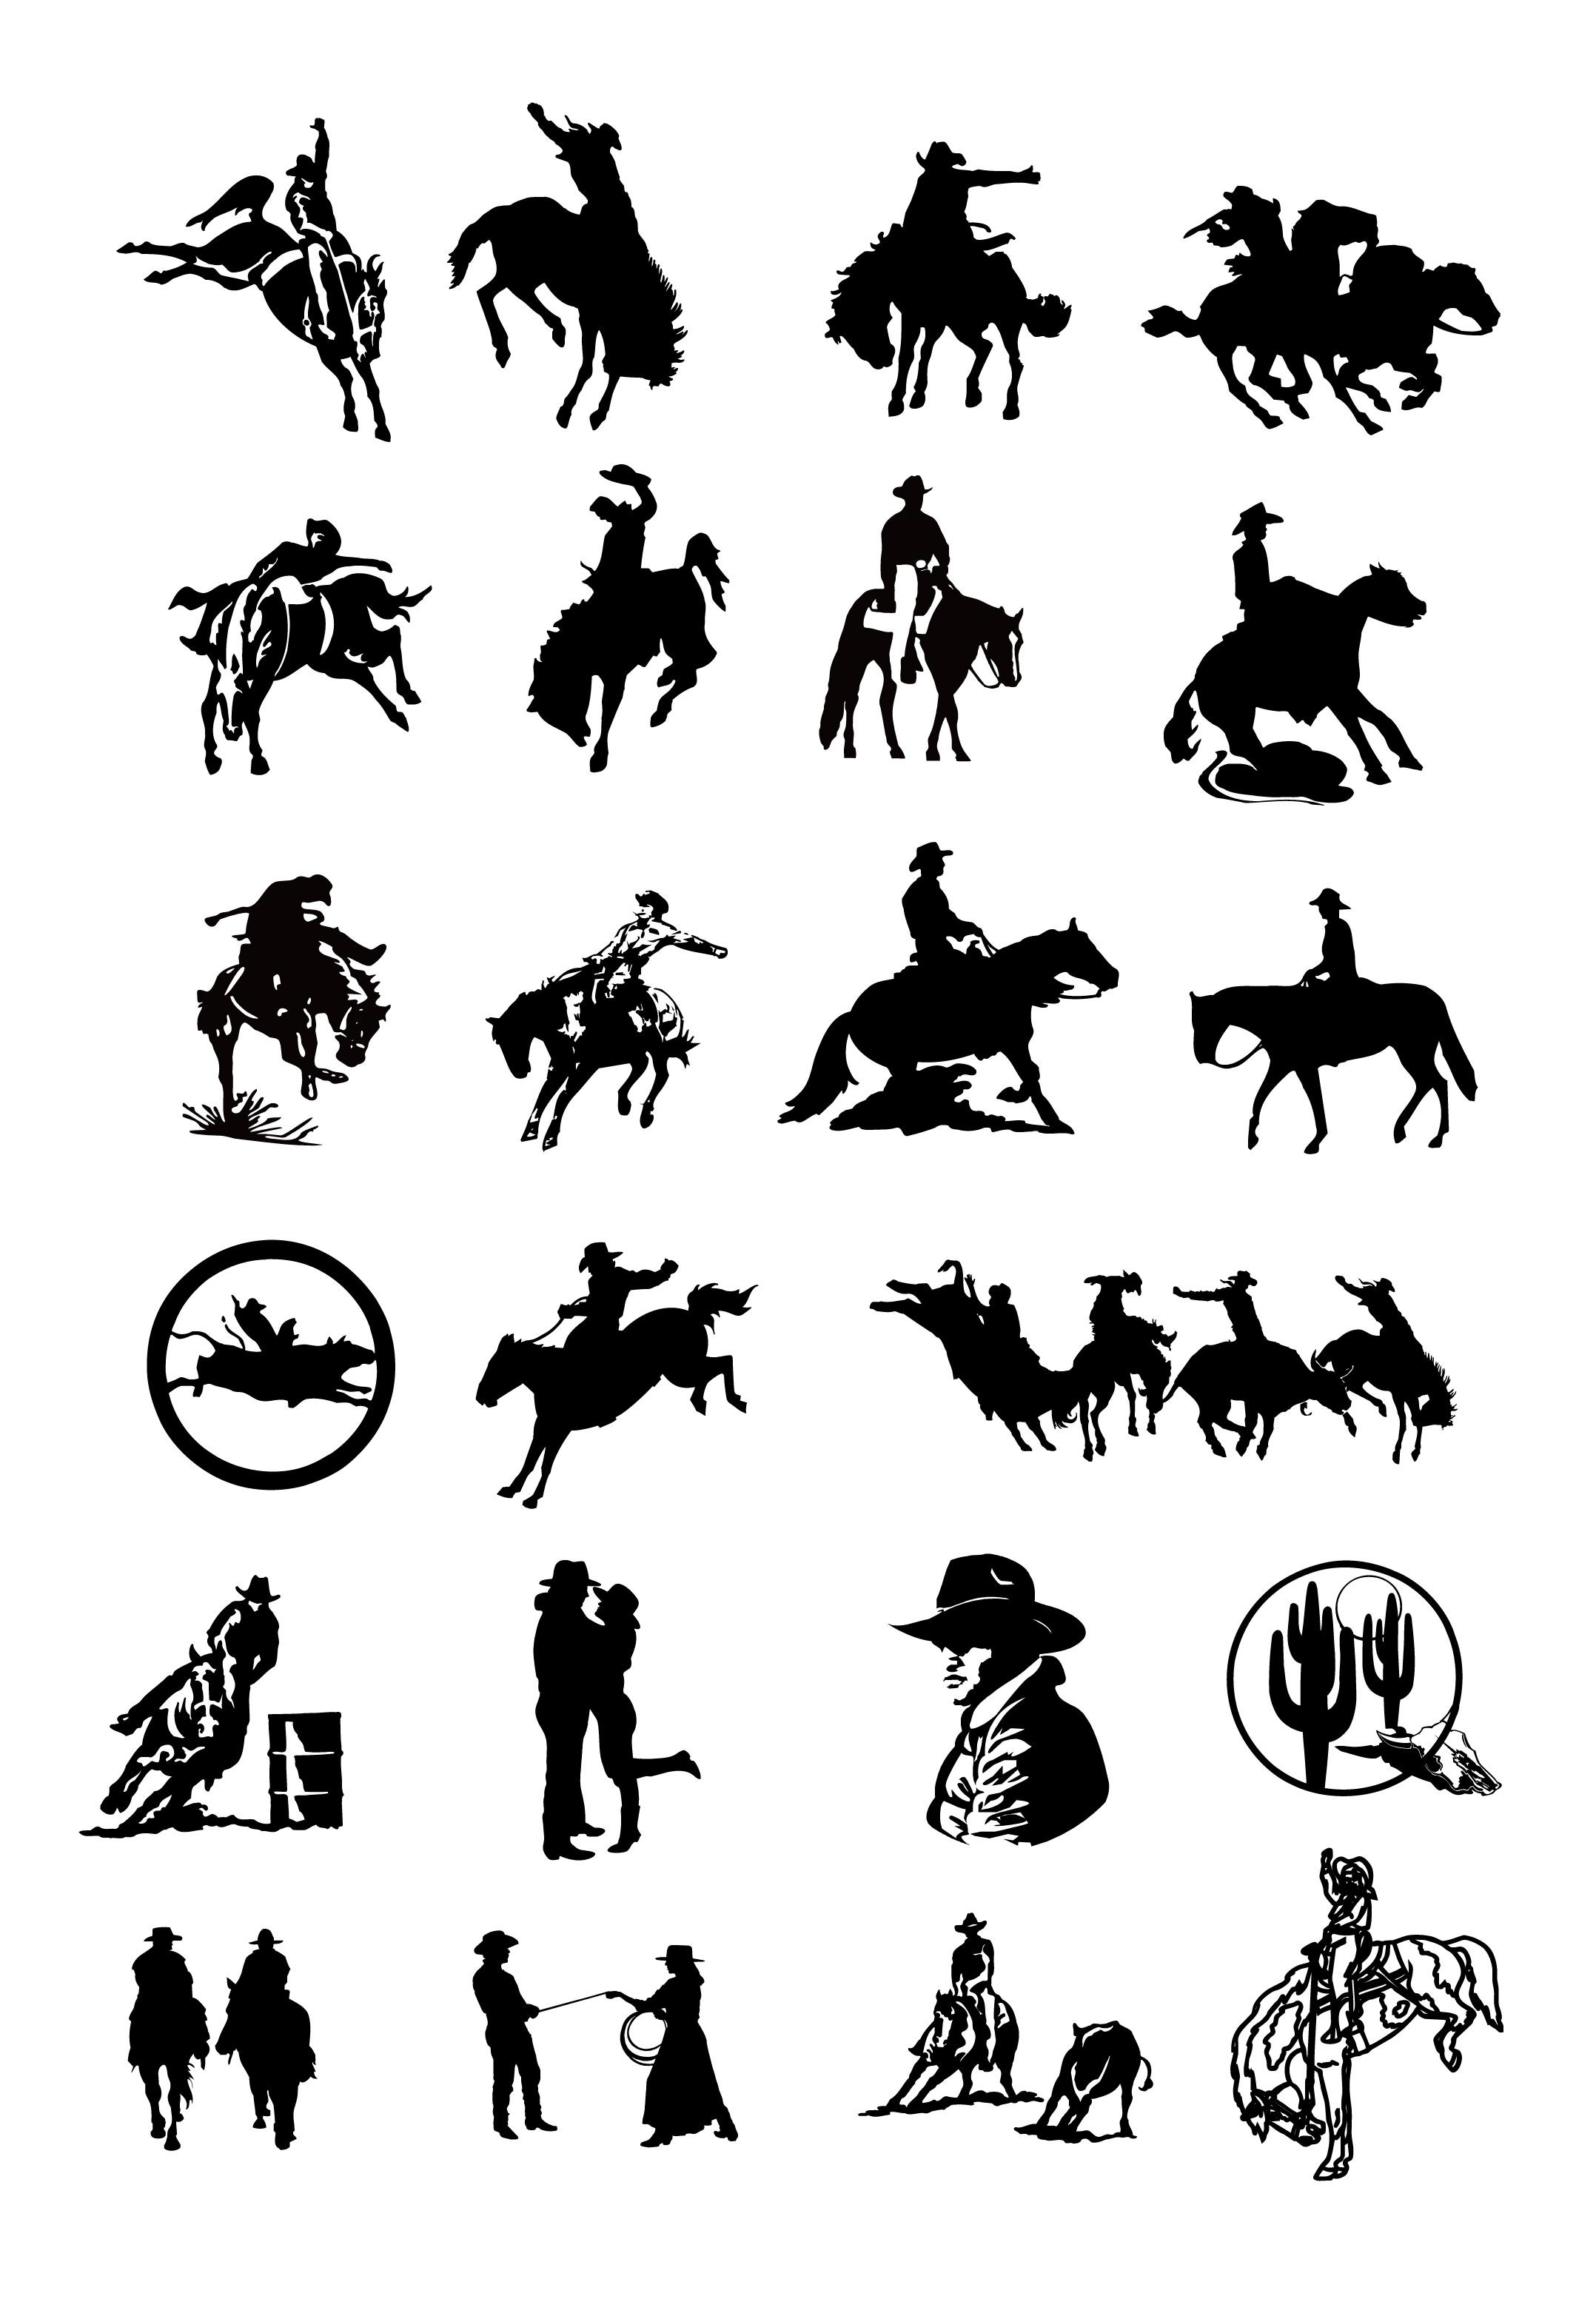 Free Cowboy Image Download Free Clip Art Free Clip Art